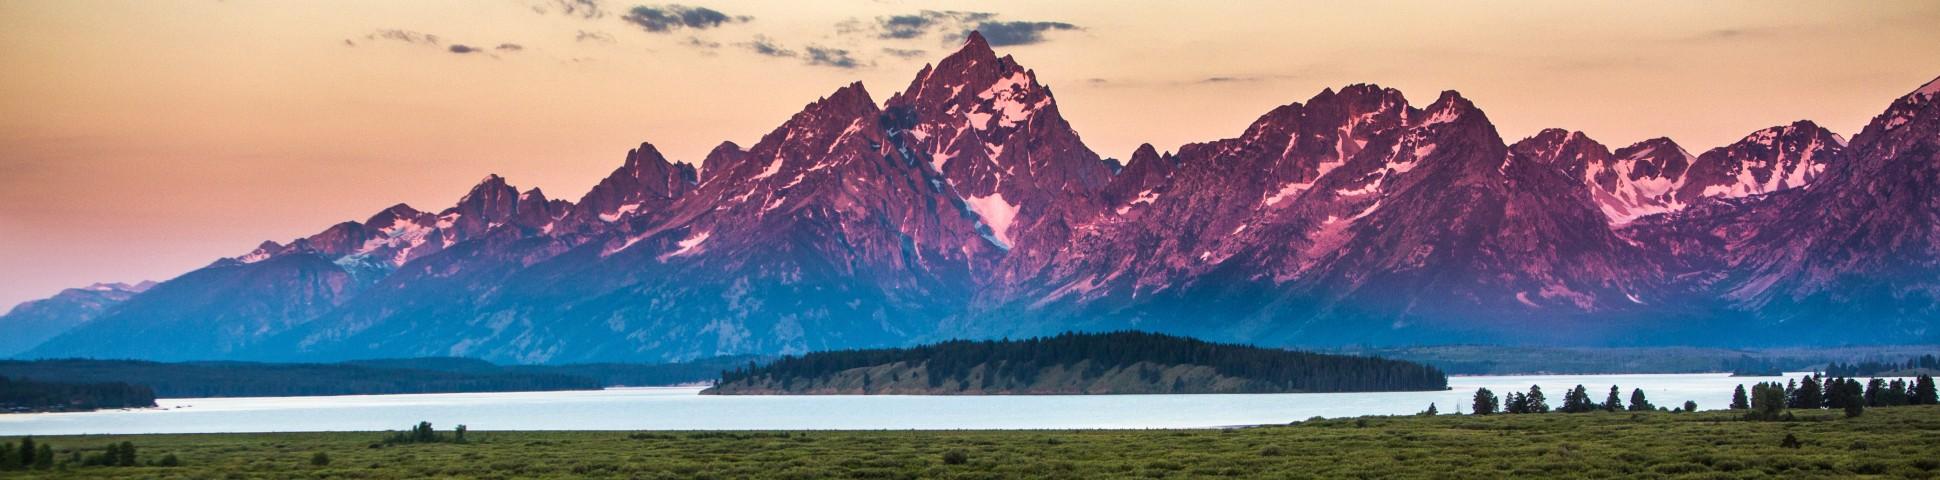 Sunset over Grand Teton National Park (Wyoming)